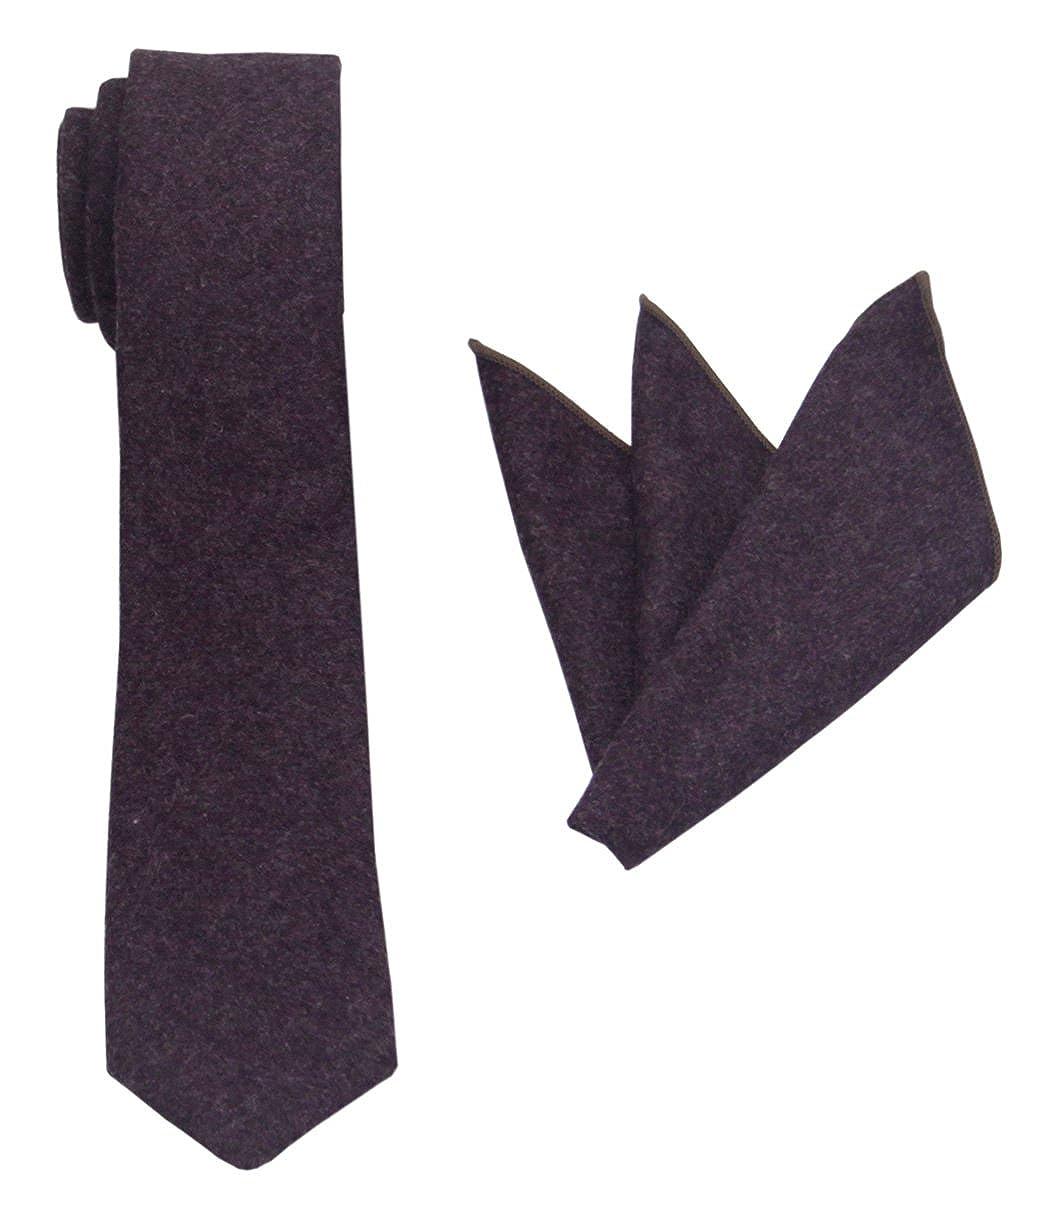 Slim Plain Necktie and Pocket Square Set-Various Colors Mens Solid Wool Tie